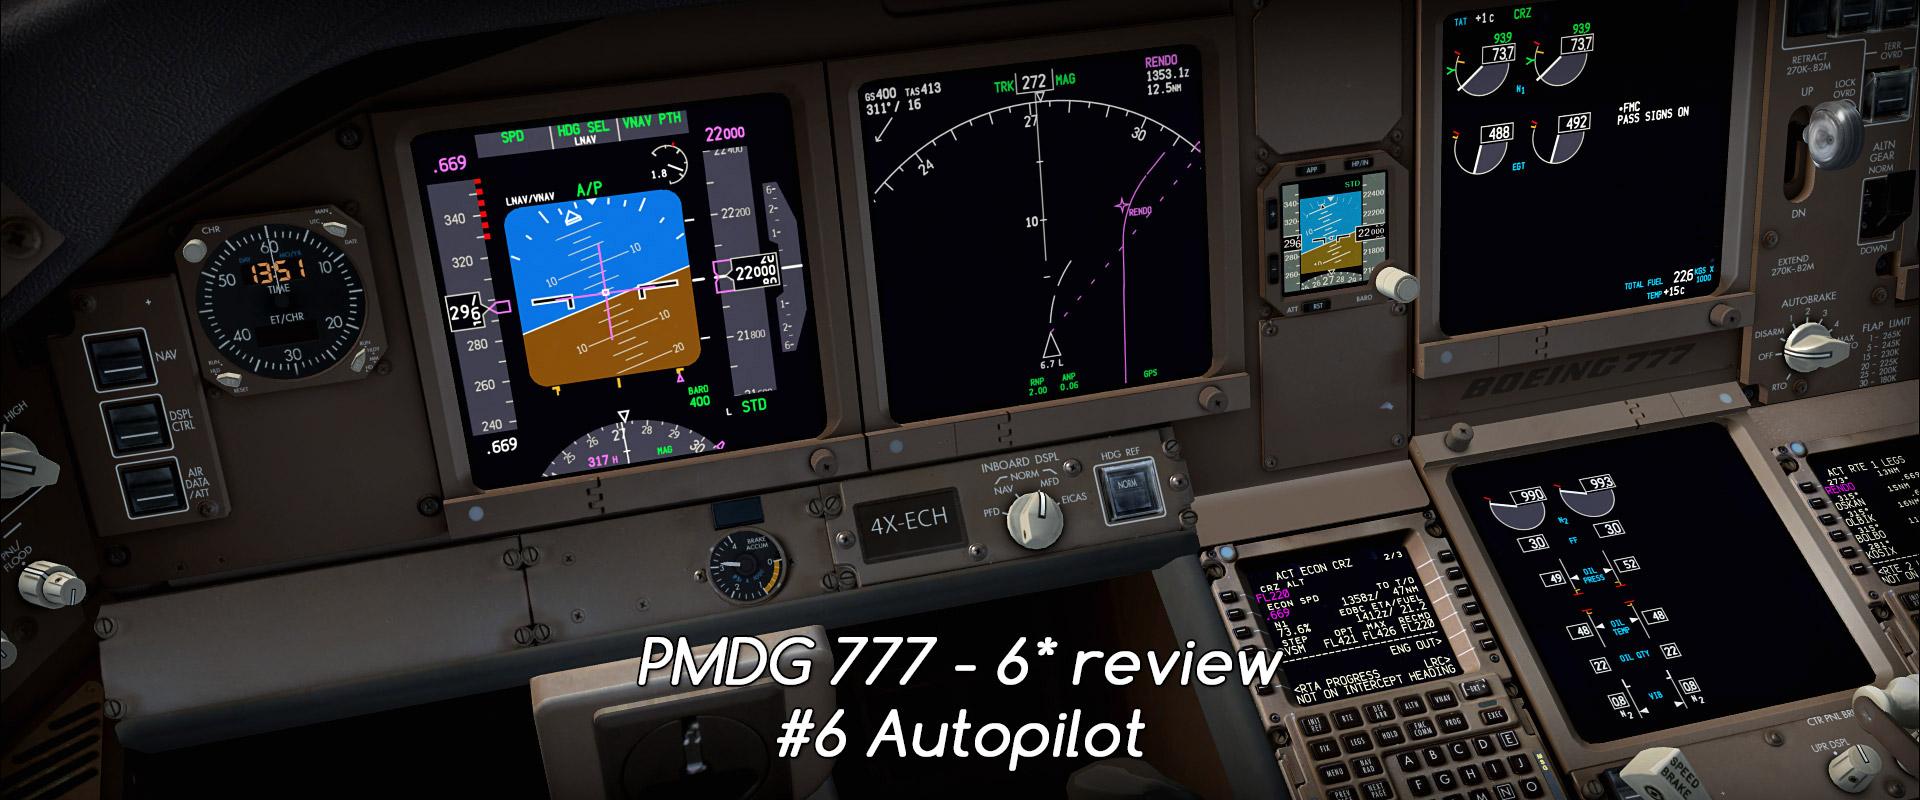 Boeing 777 PMDG Part 6 Autopilot O C Aviation